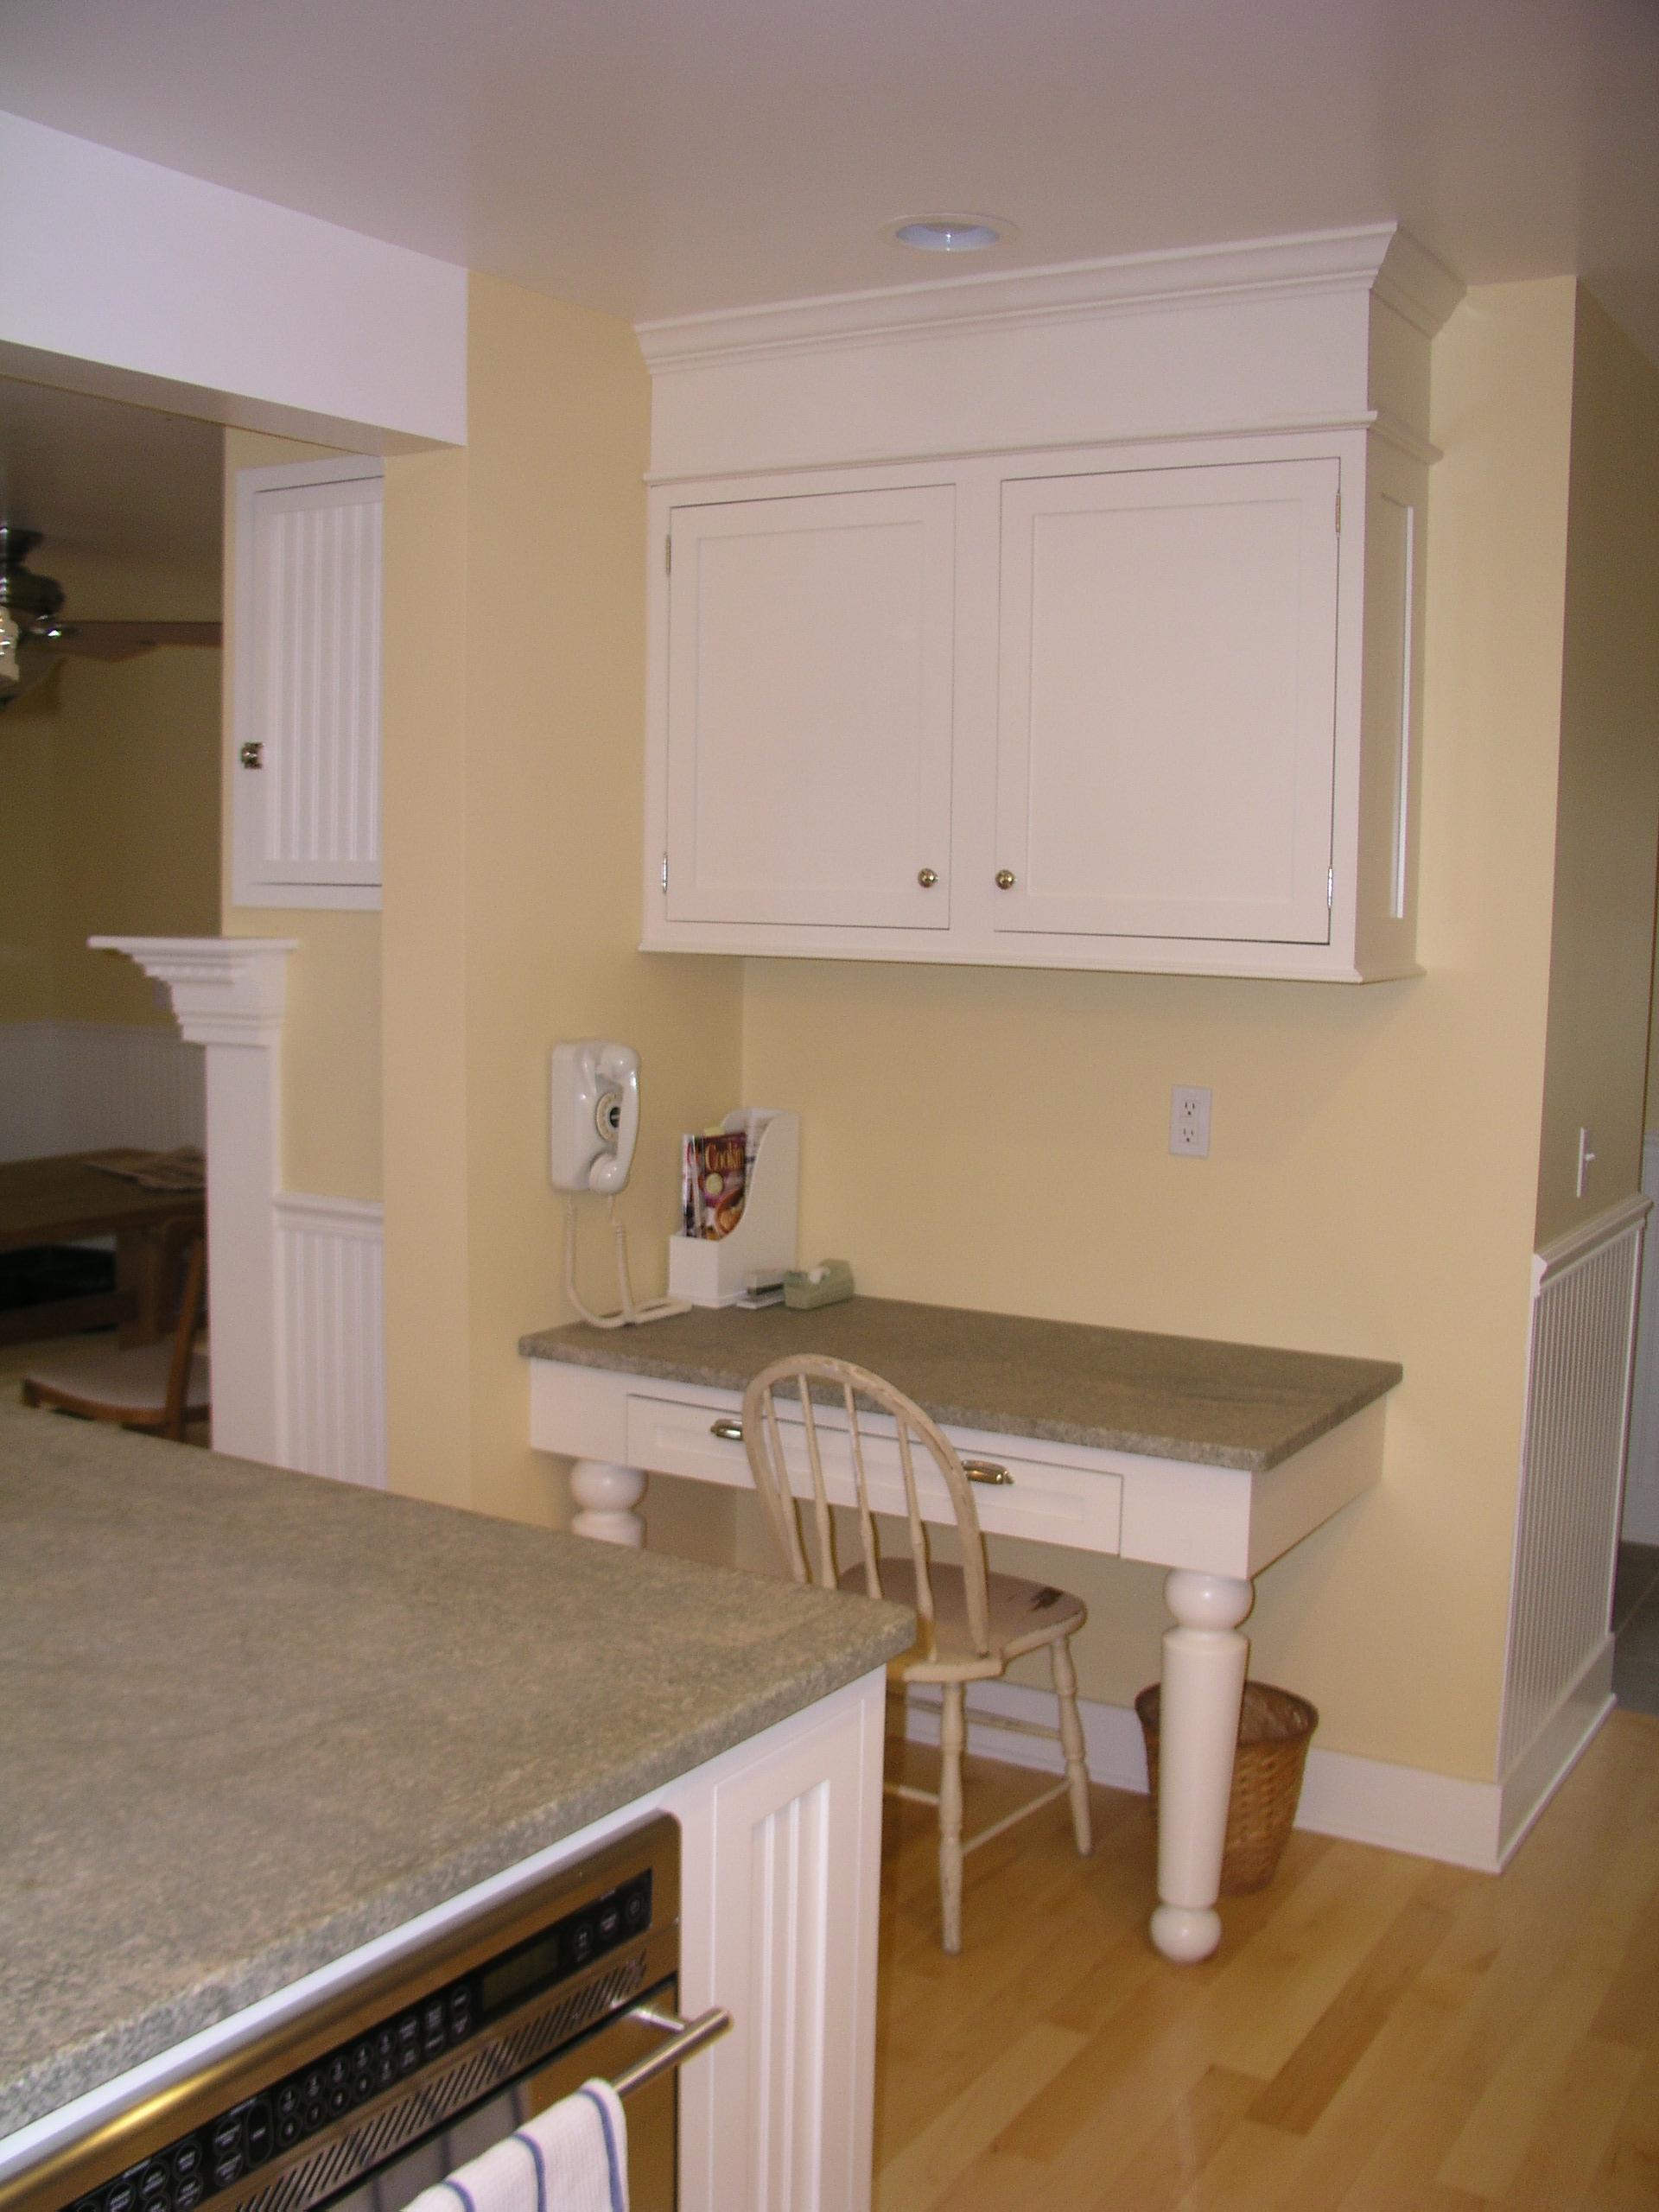 Beadboard look in milford ct kitchen design center for Kitchen design center